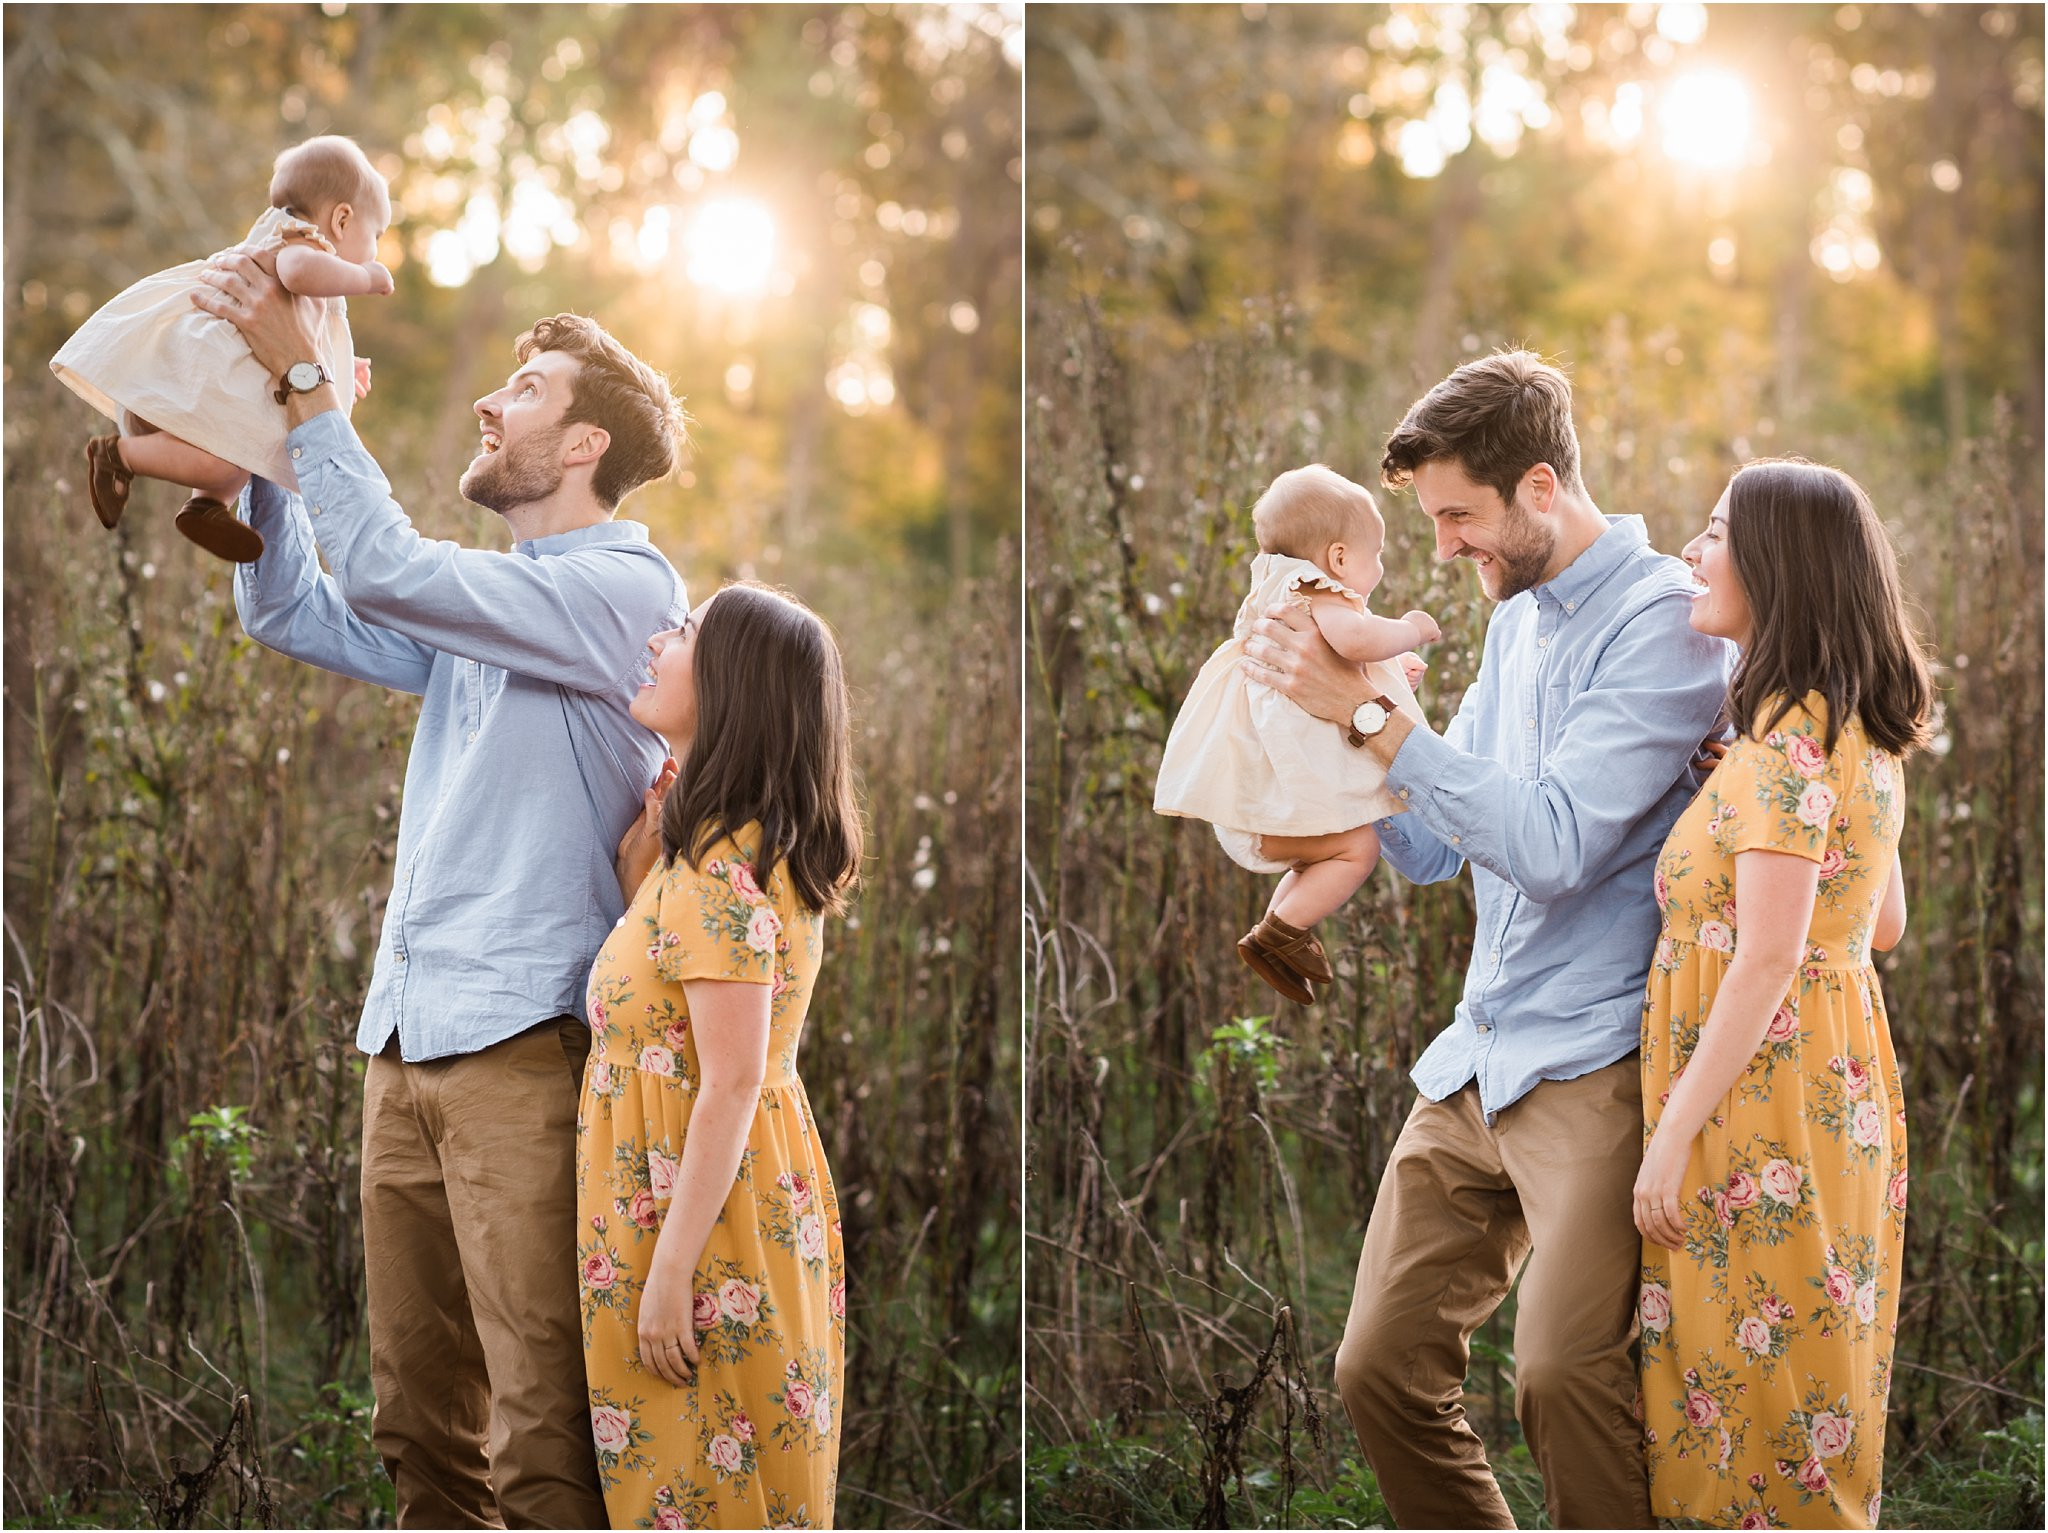 Pittsburgh Rachel Rossetti Family Lifestyle Photography_0275.jpg